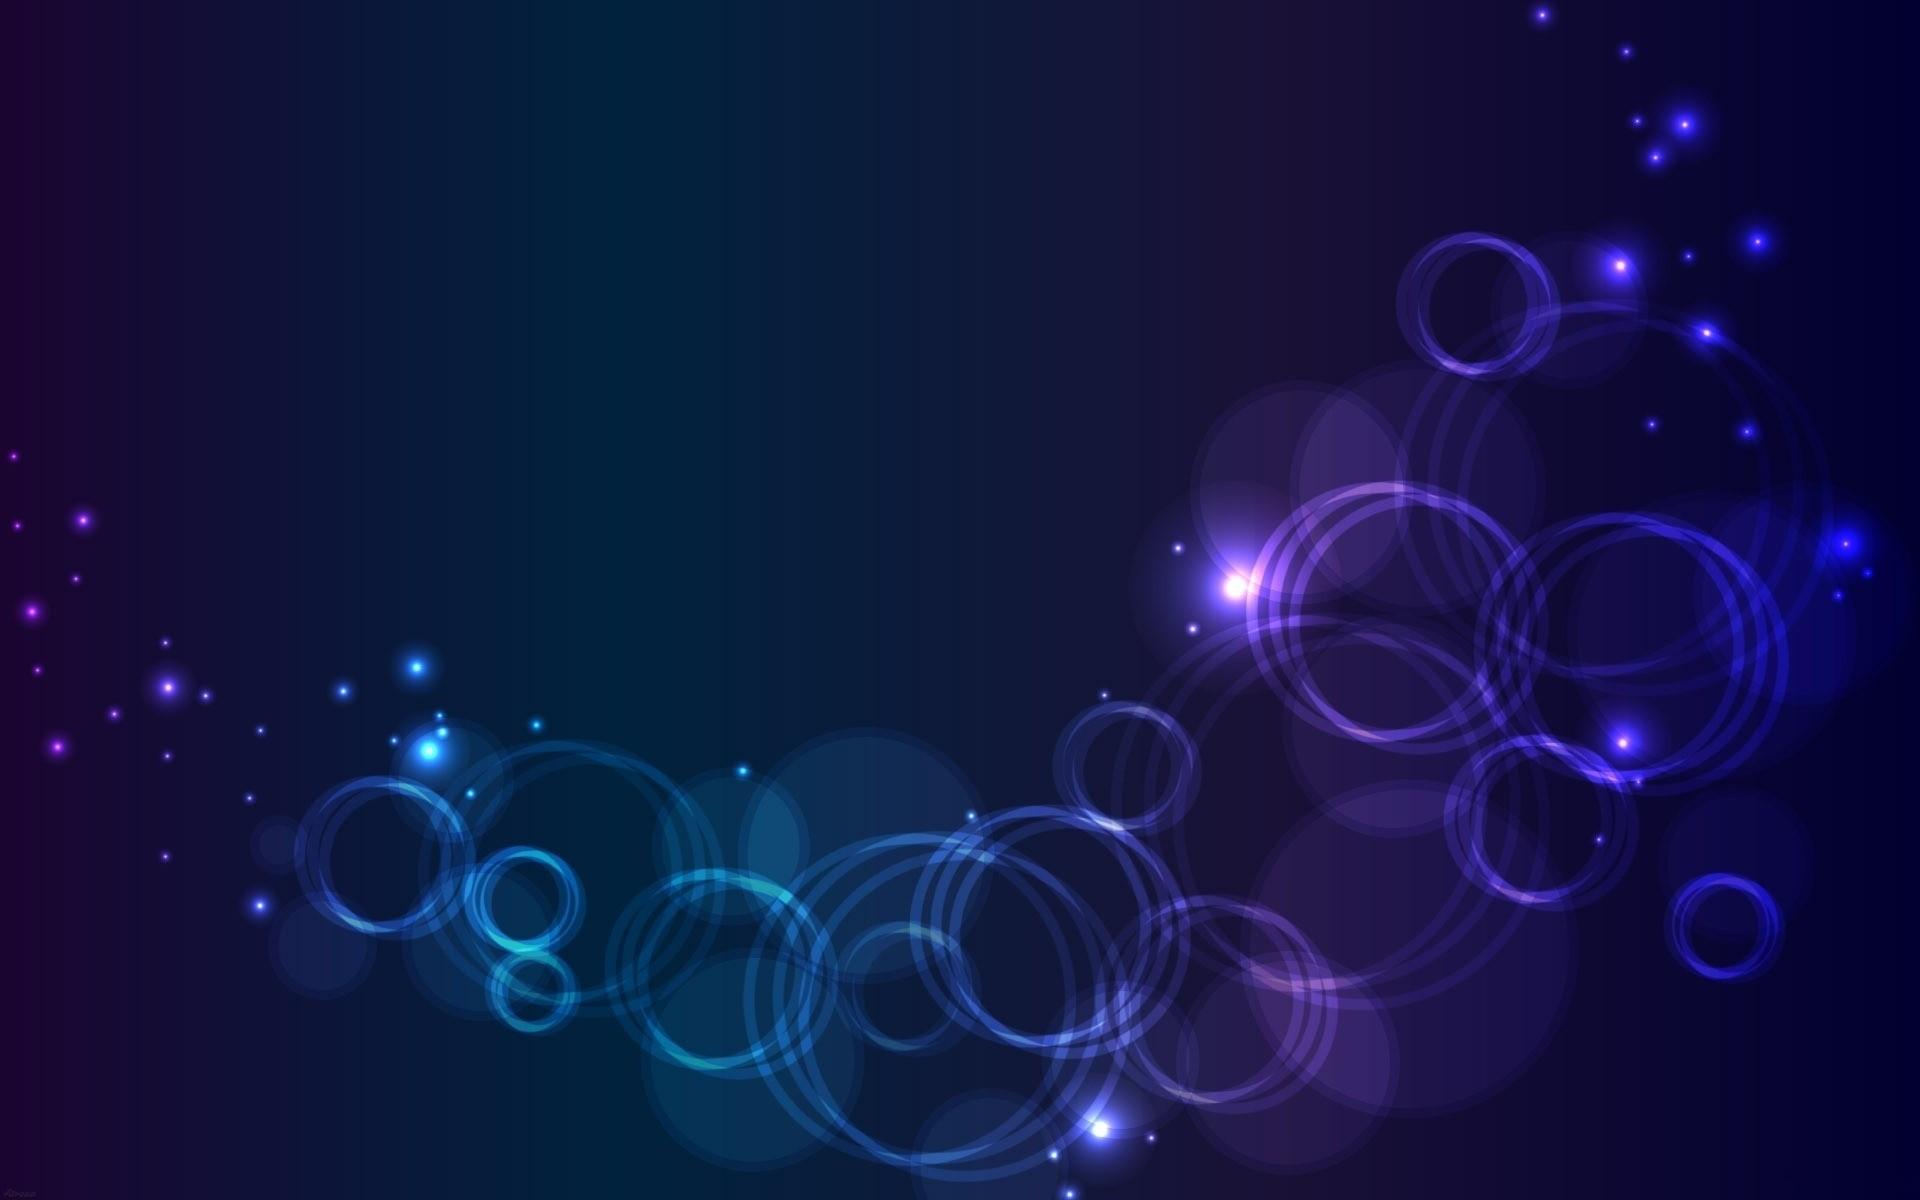 Bubble Wallpaper; Bubble Wallpaper; Bubble Wallpaper ...